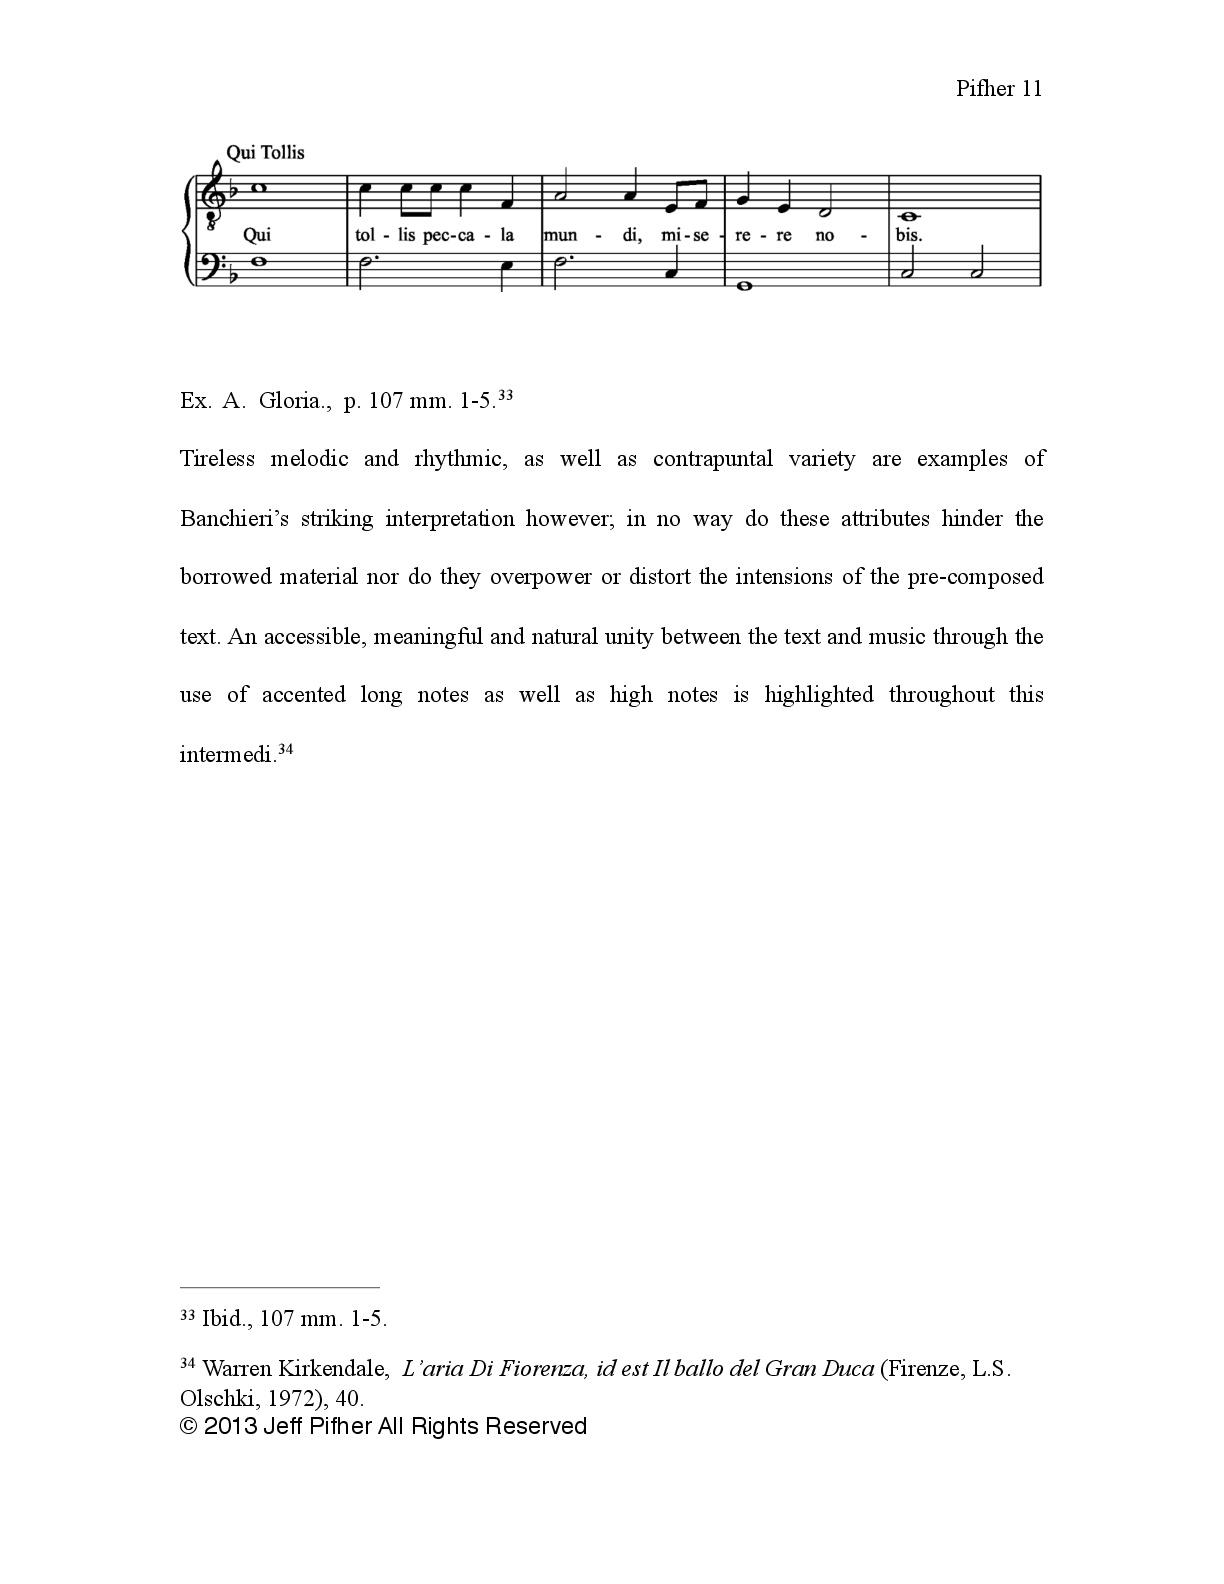 Jeff-Pifher-Music-and-Mediciean-Influences-(Academic-Series)-011.jpg